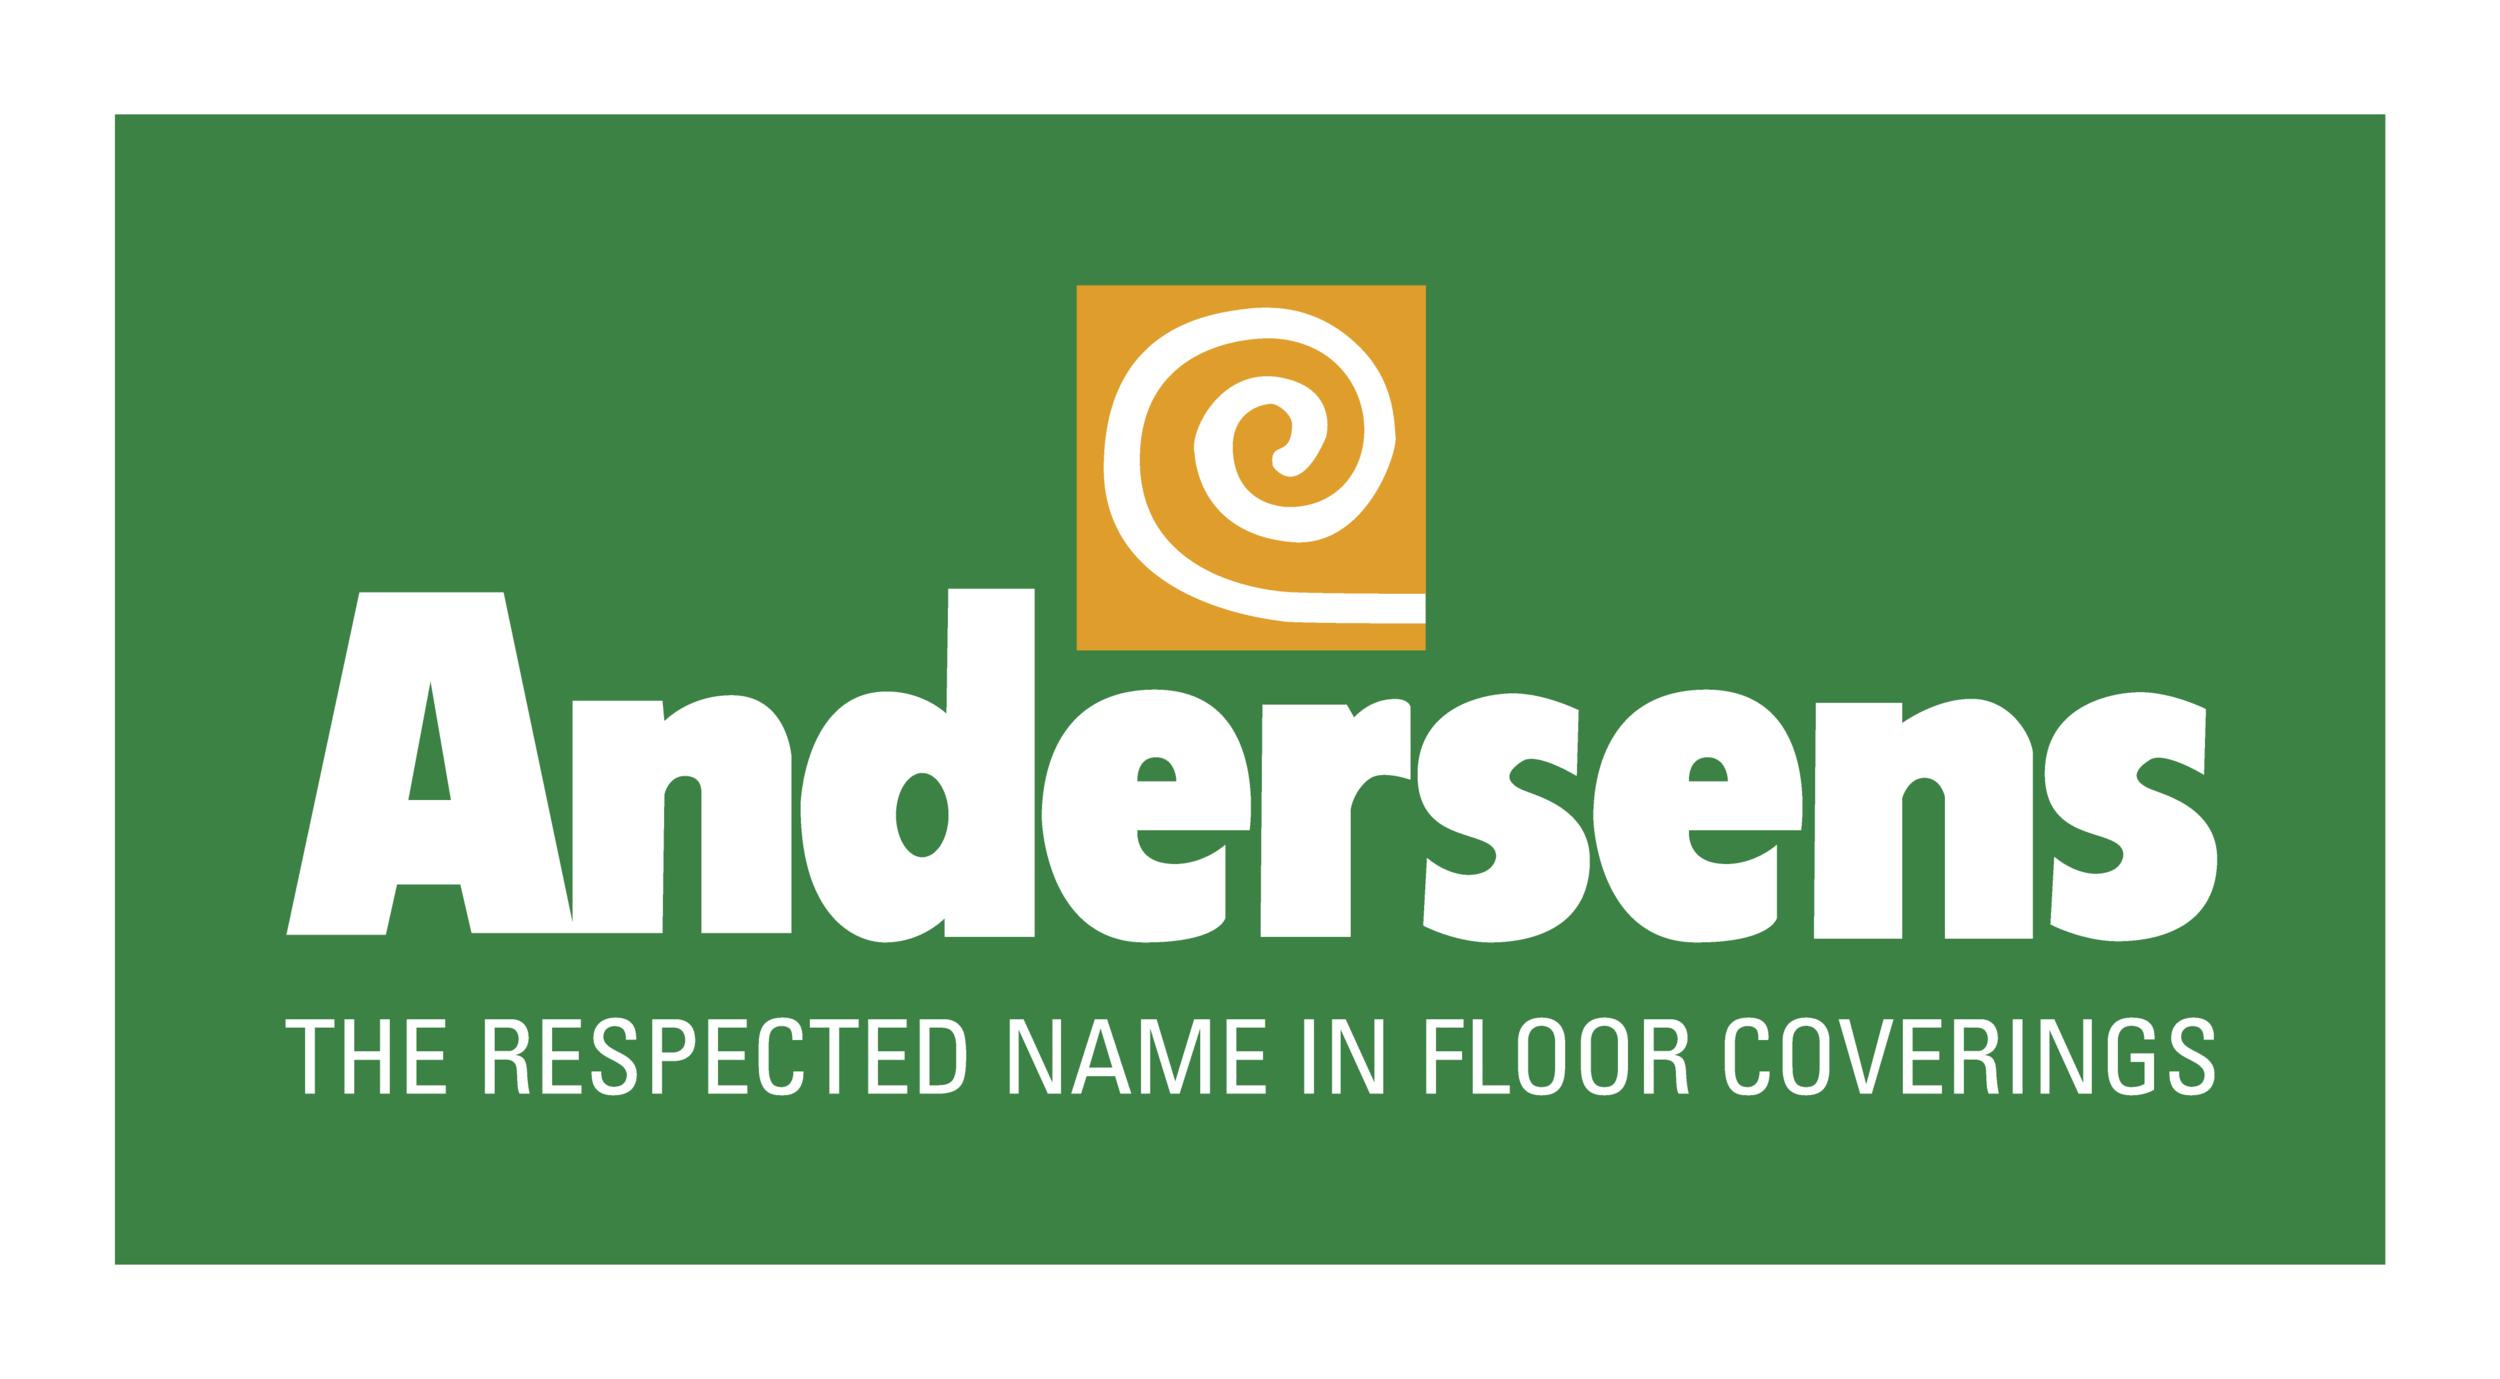 ANDERSENS_LOGO_Tall_Reverse_GreenBorder.png